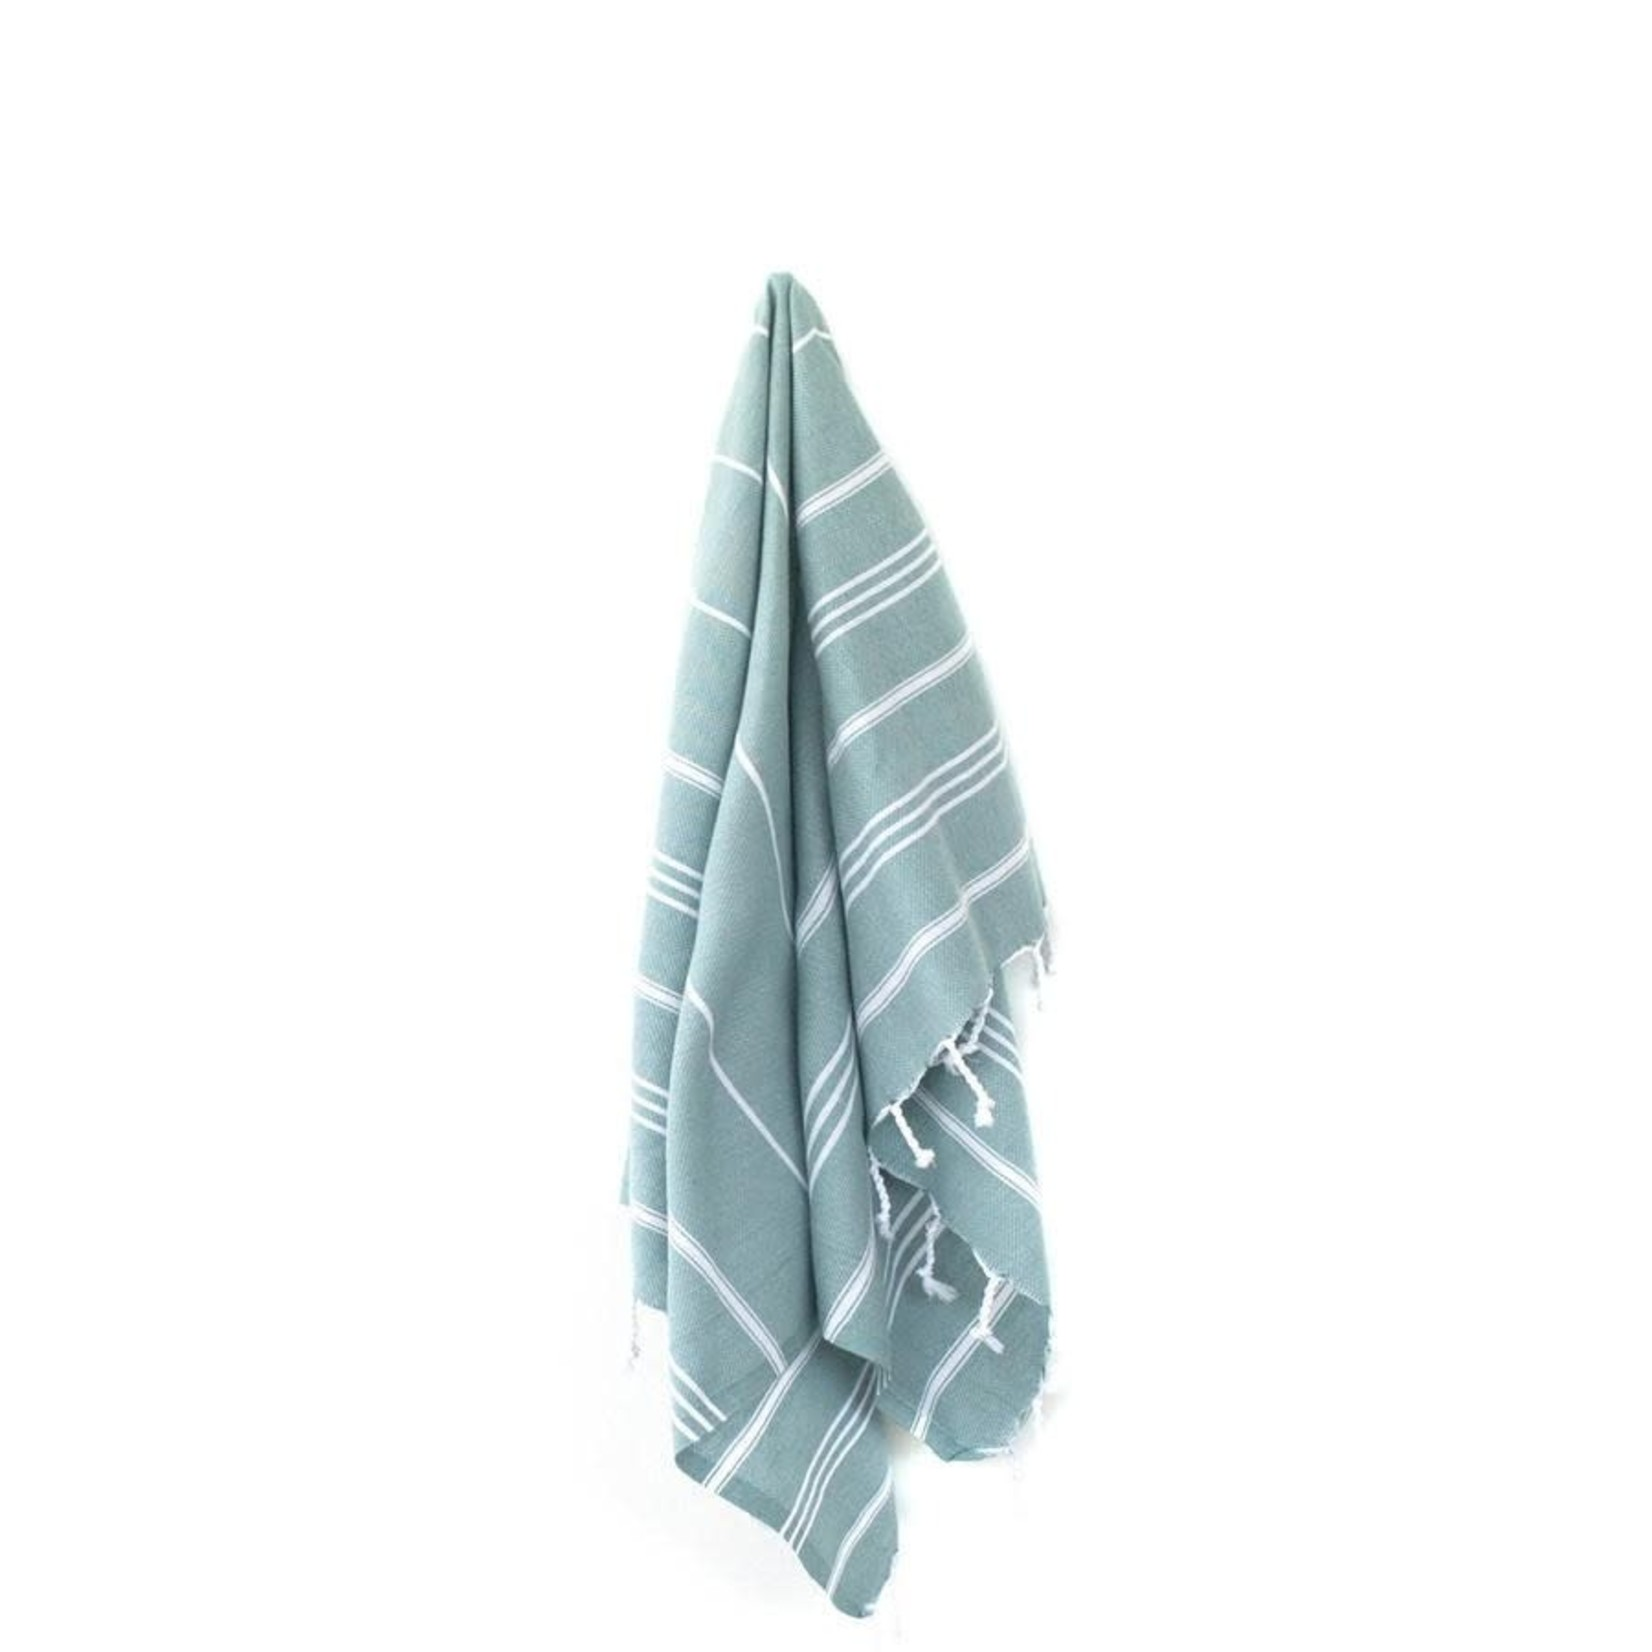 MARIN SMALL TOWEL - GREEN